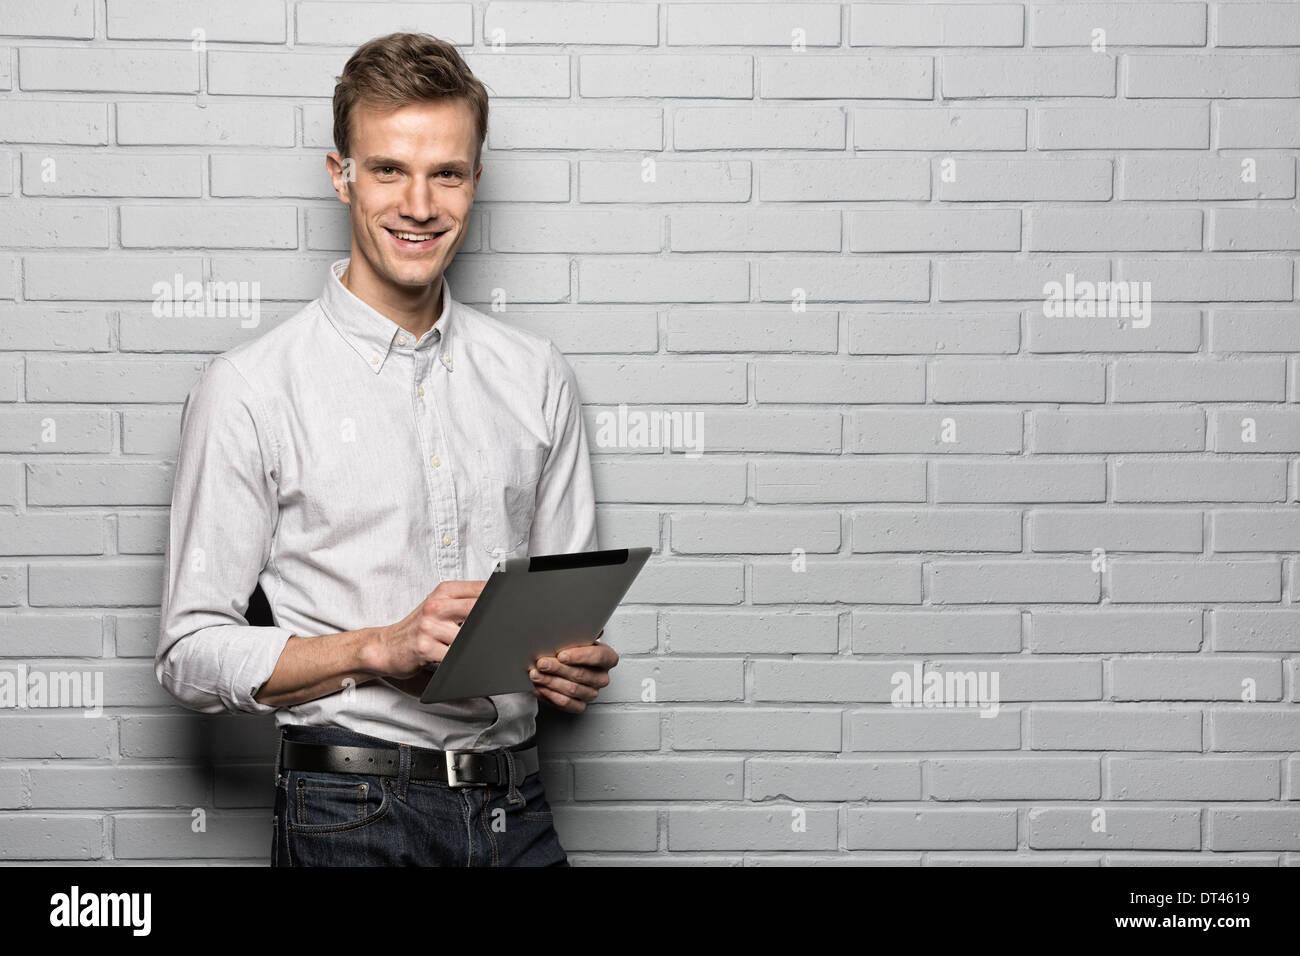 Male portrait smiling digital tablet studio brick looking camera - Stock Image